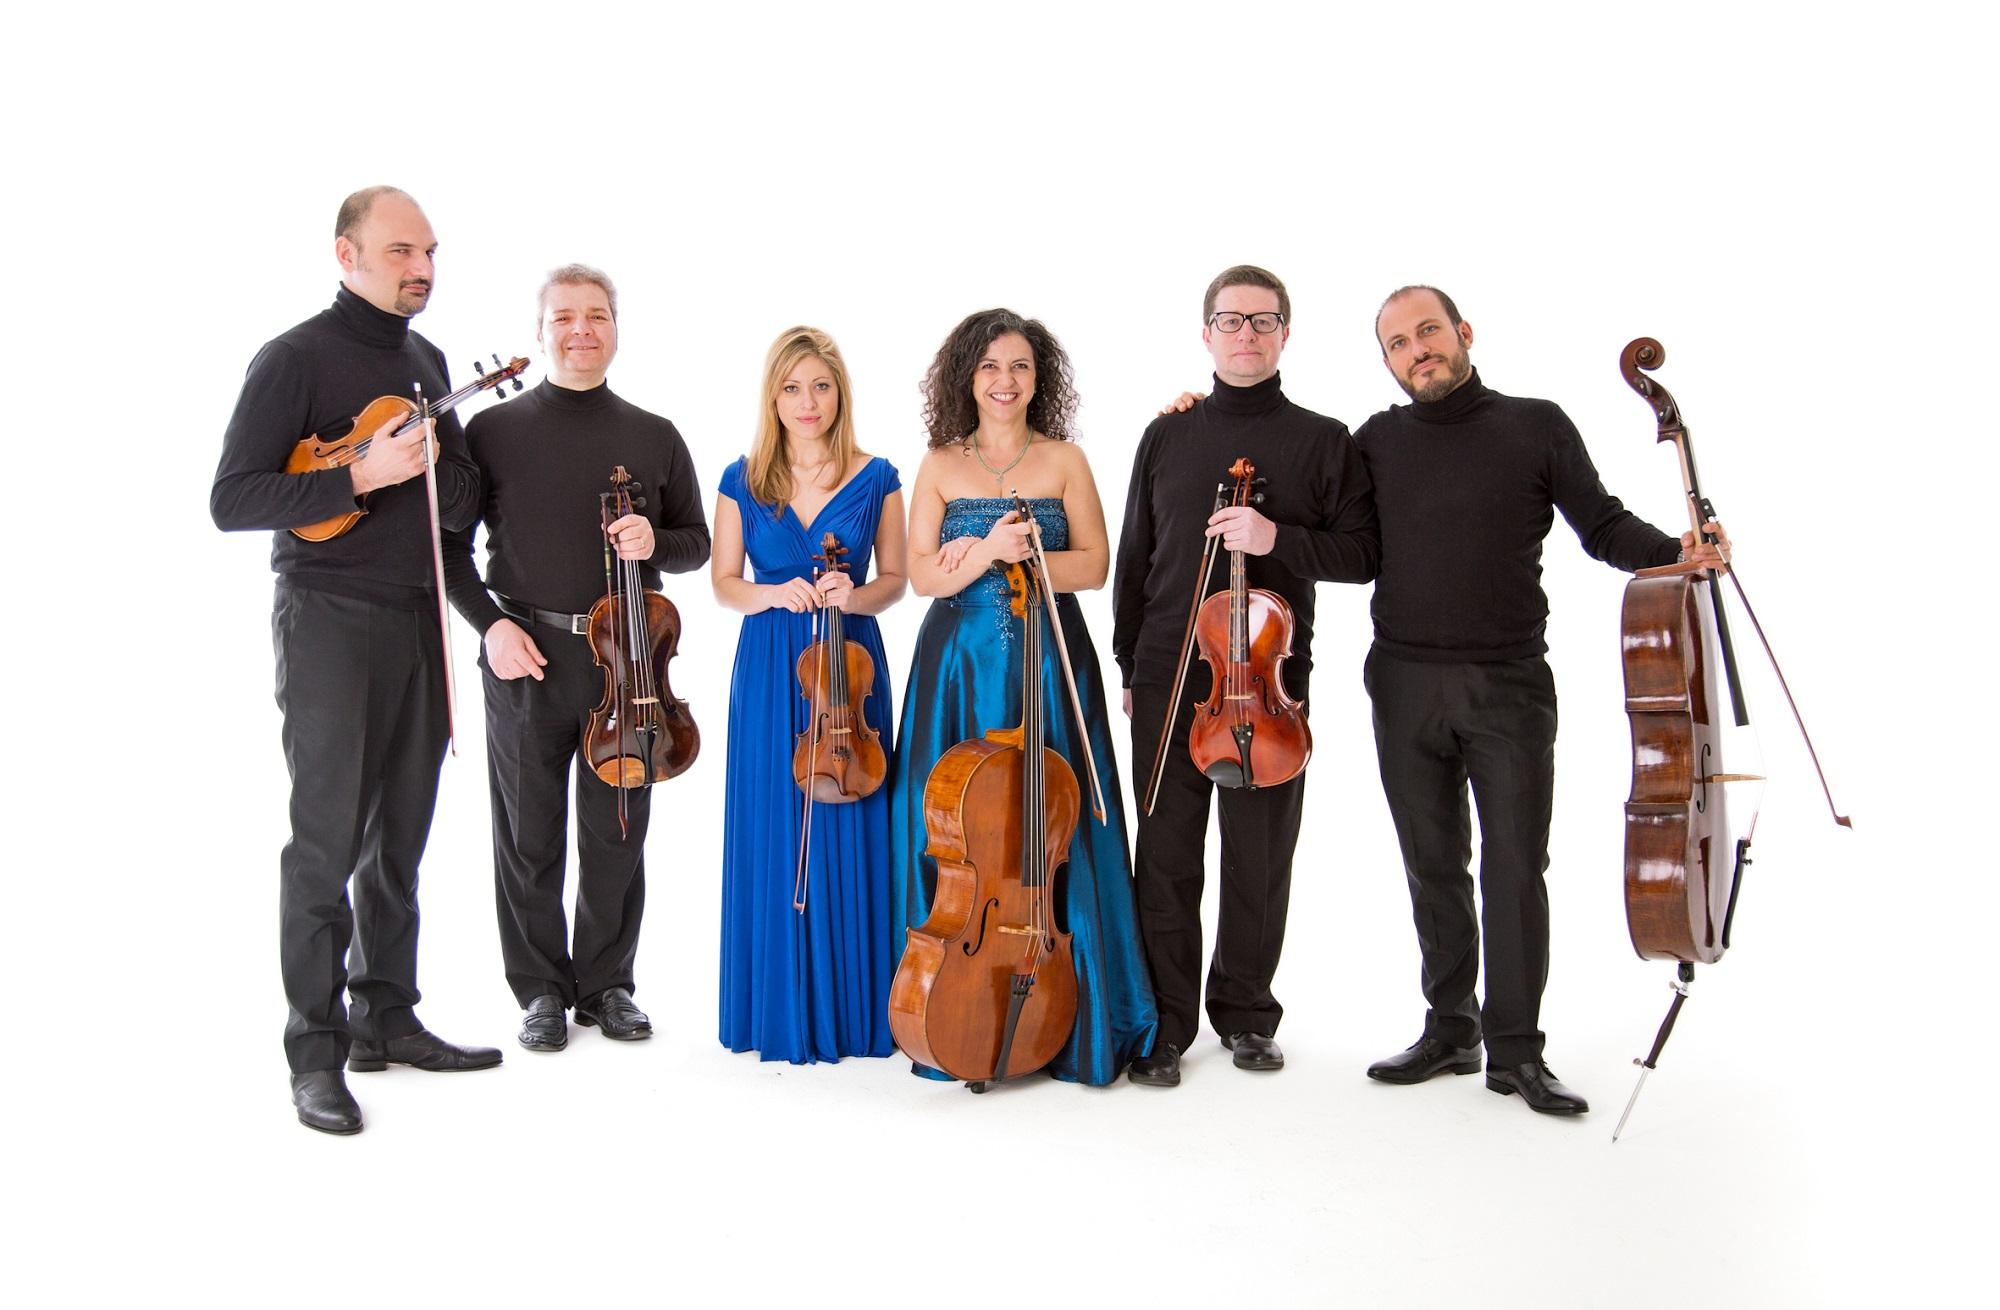 Sestetto Stradivari -® Sonia Ponzo4